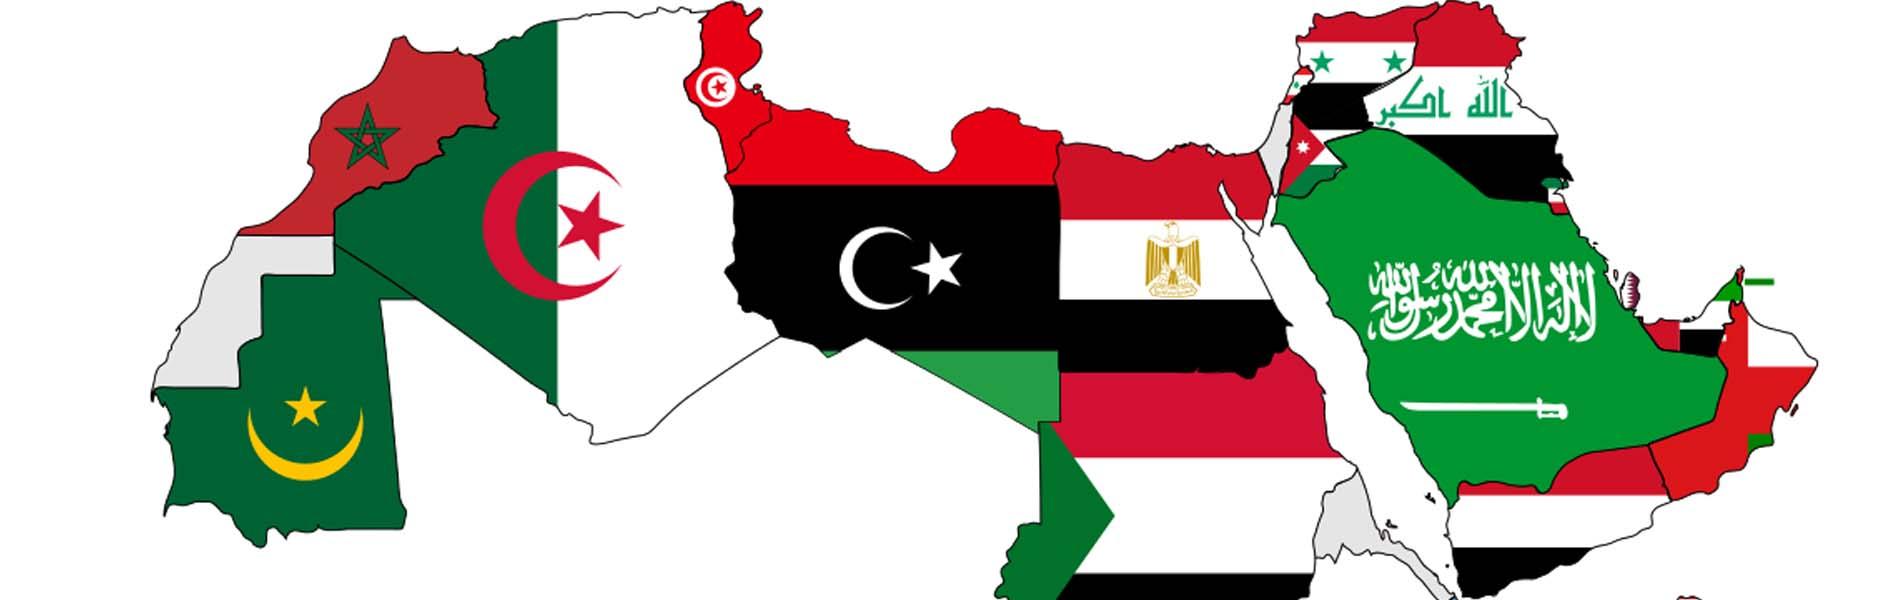 Degree Attestation from Qatar, UAE, Oman, Bahrain, Kuwait Embassies